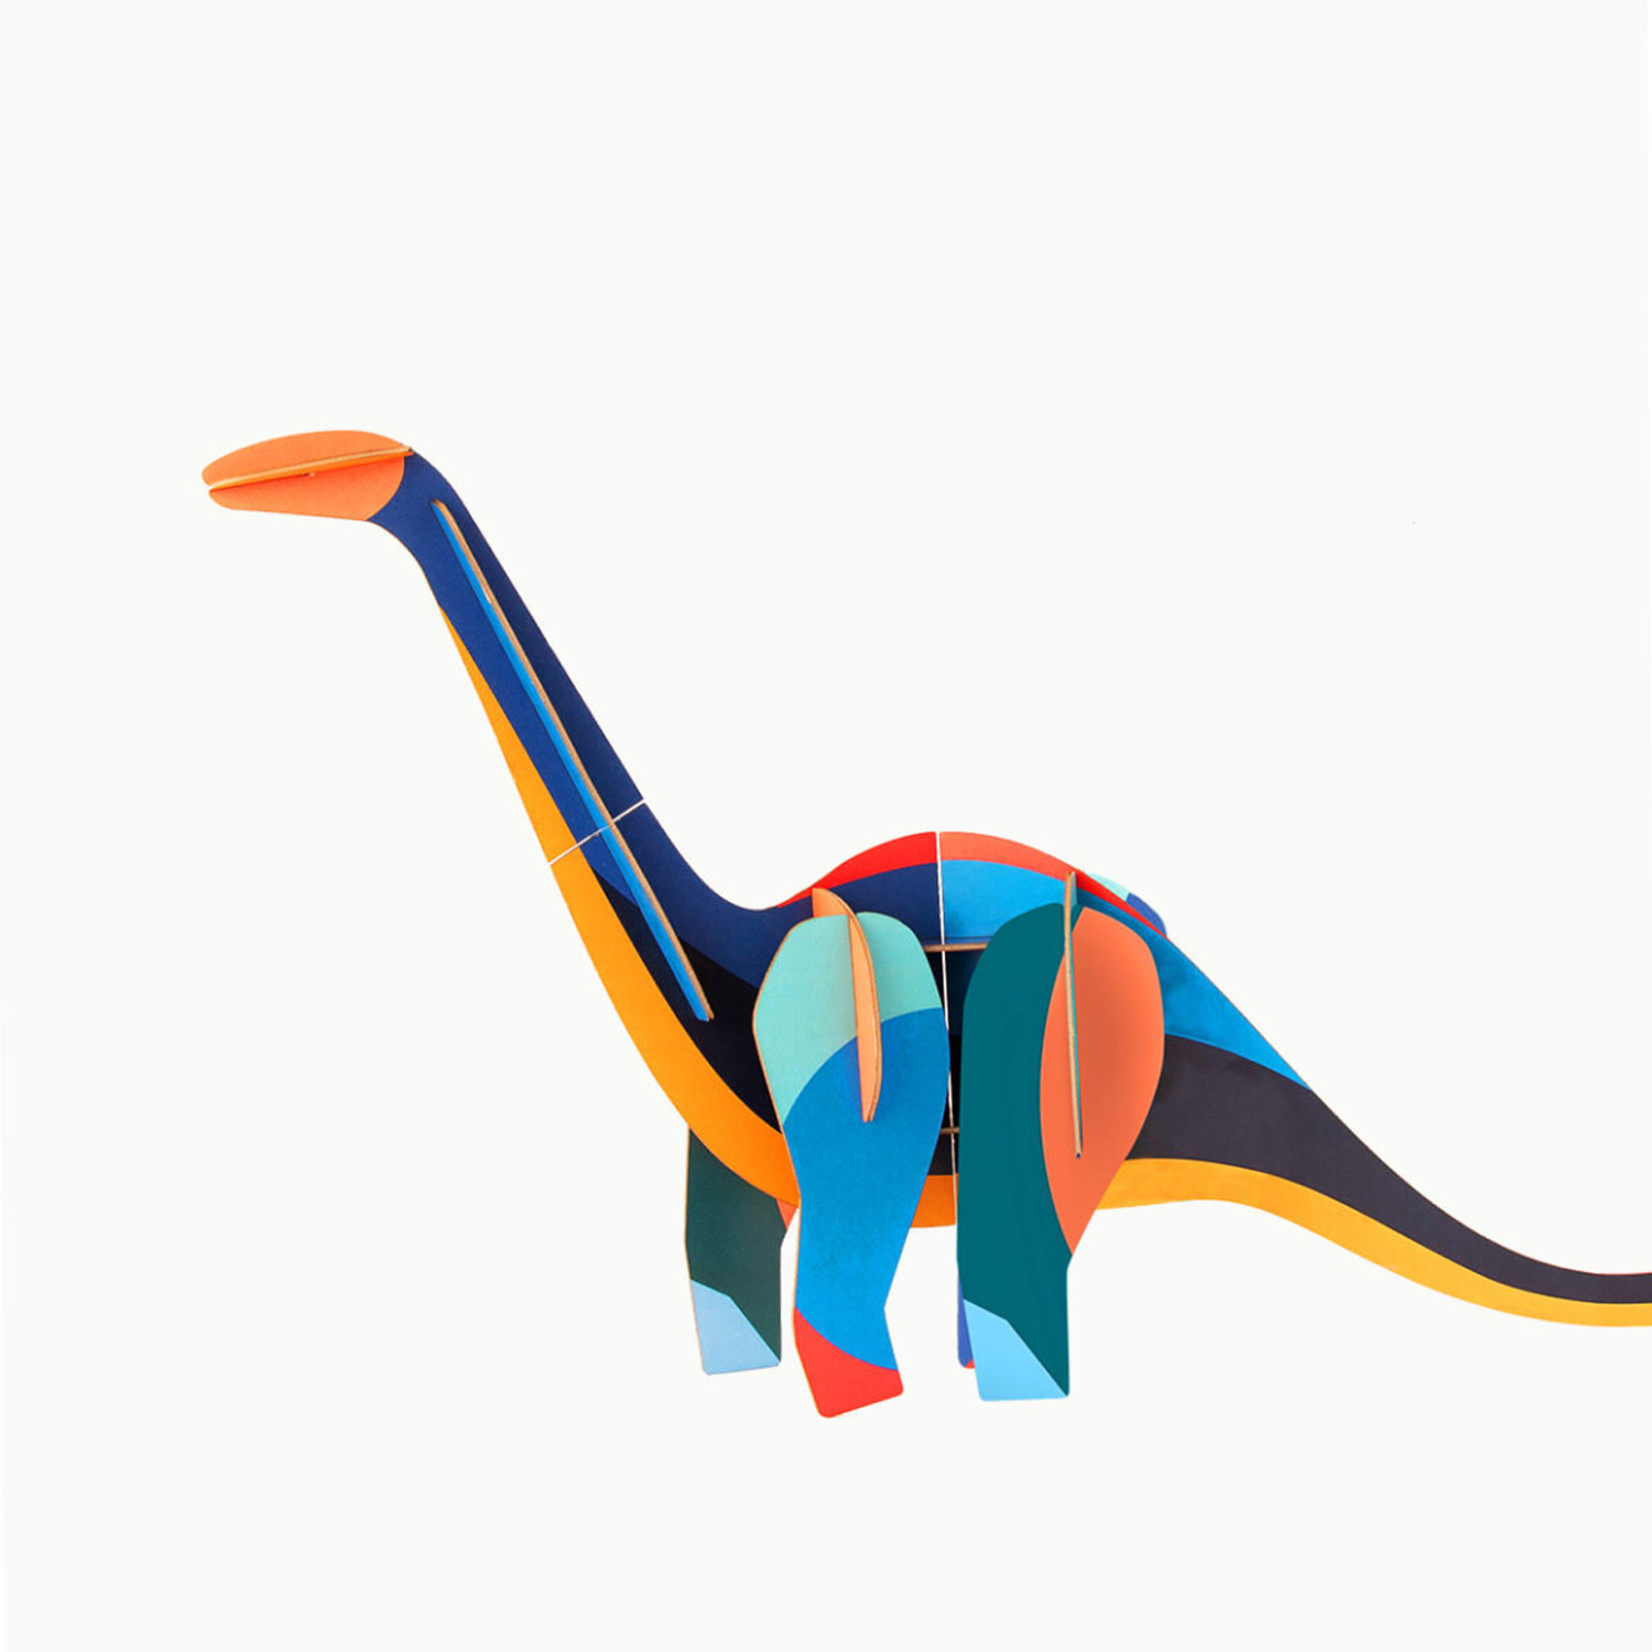 Cardboard Mythical Figures + Dinos